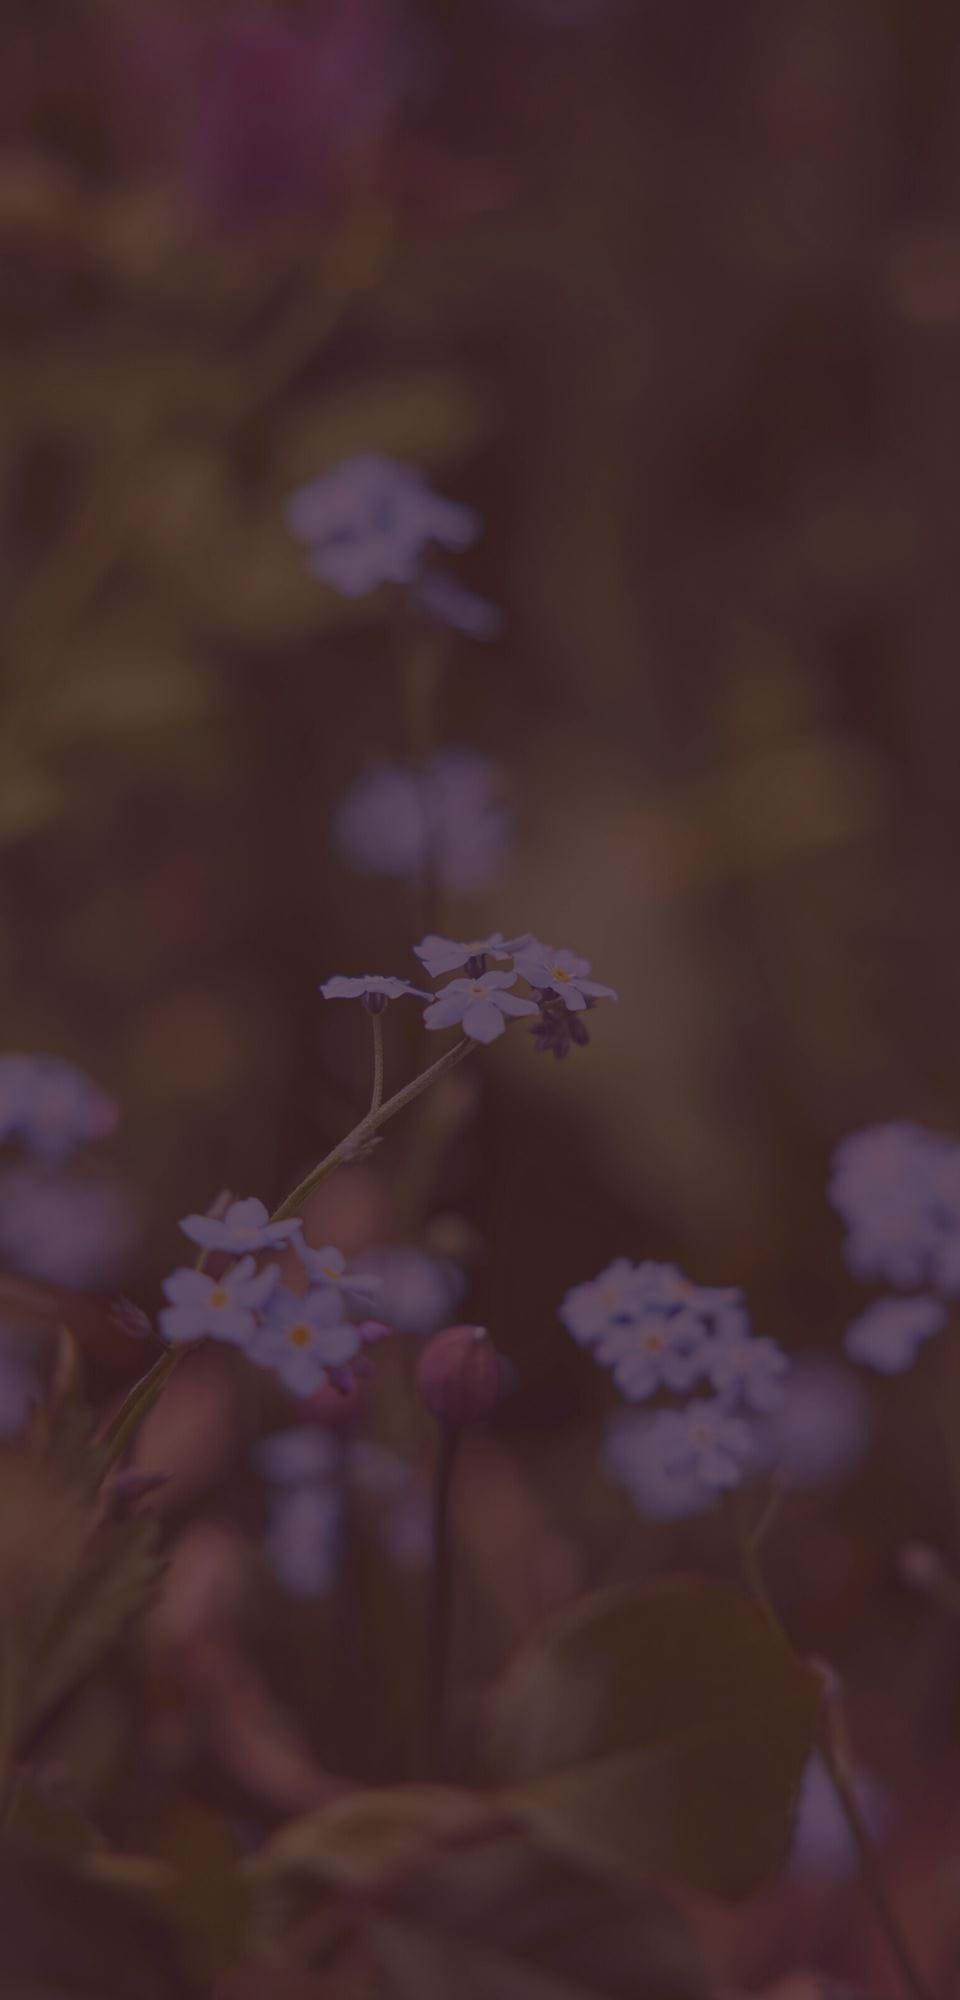 Large-Jane Cumberbatch garden - 21-05-2021 13 Clove Overlay